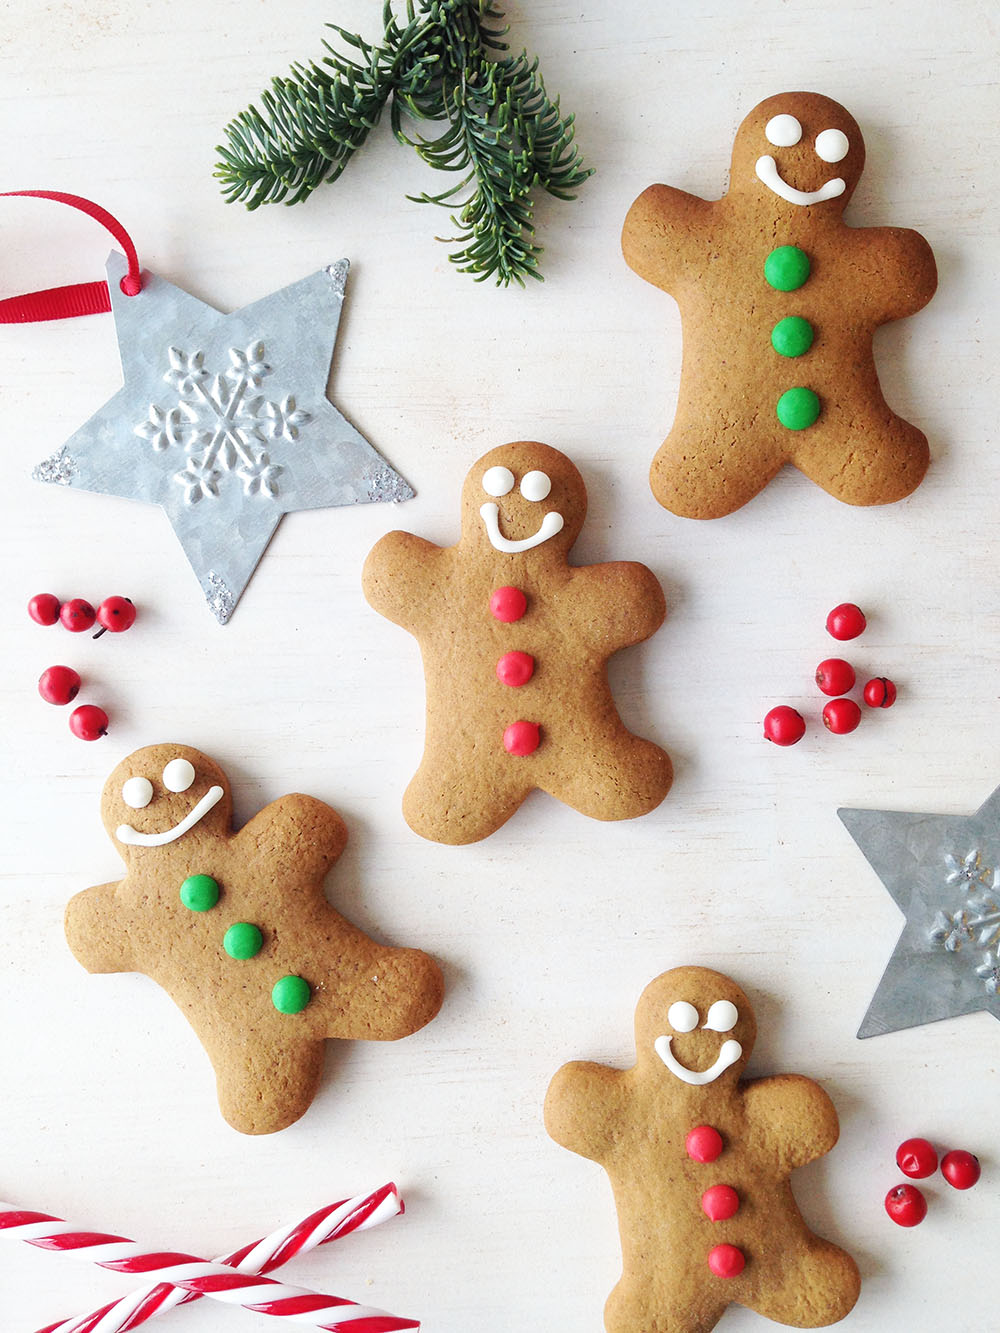 Bake Sale Toronto Christmas Treats Gingerbread Men ws.jpg